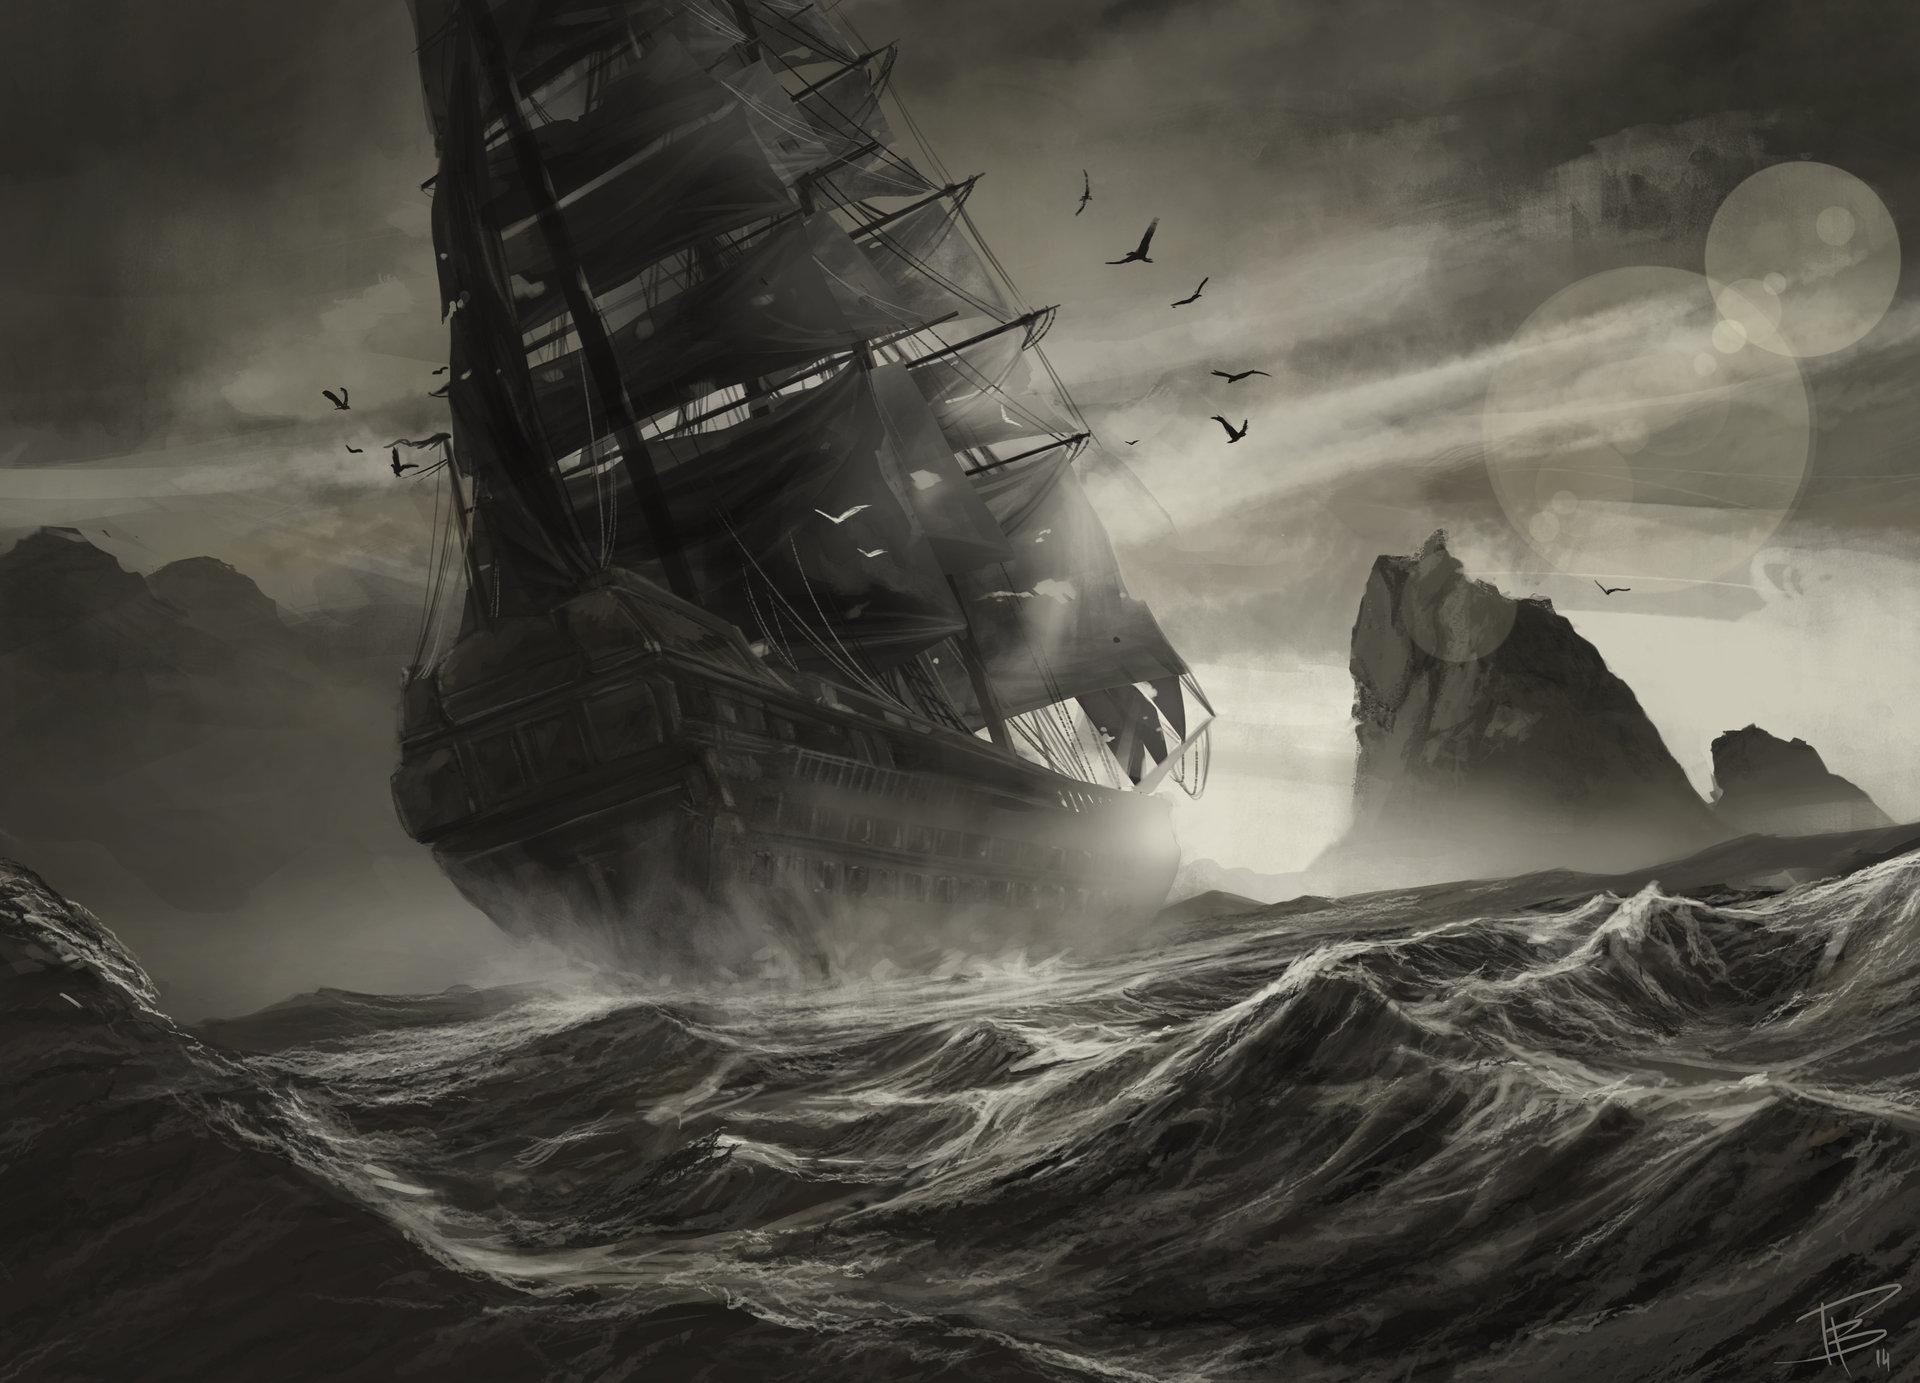 белый корабль в шторм картинки